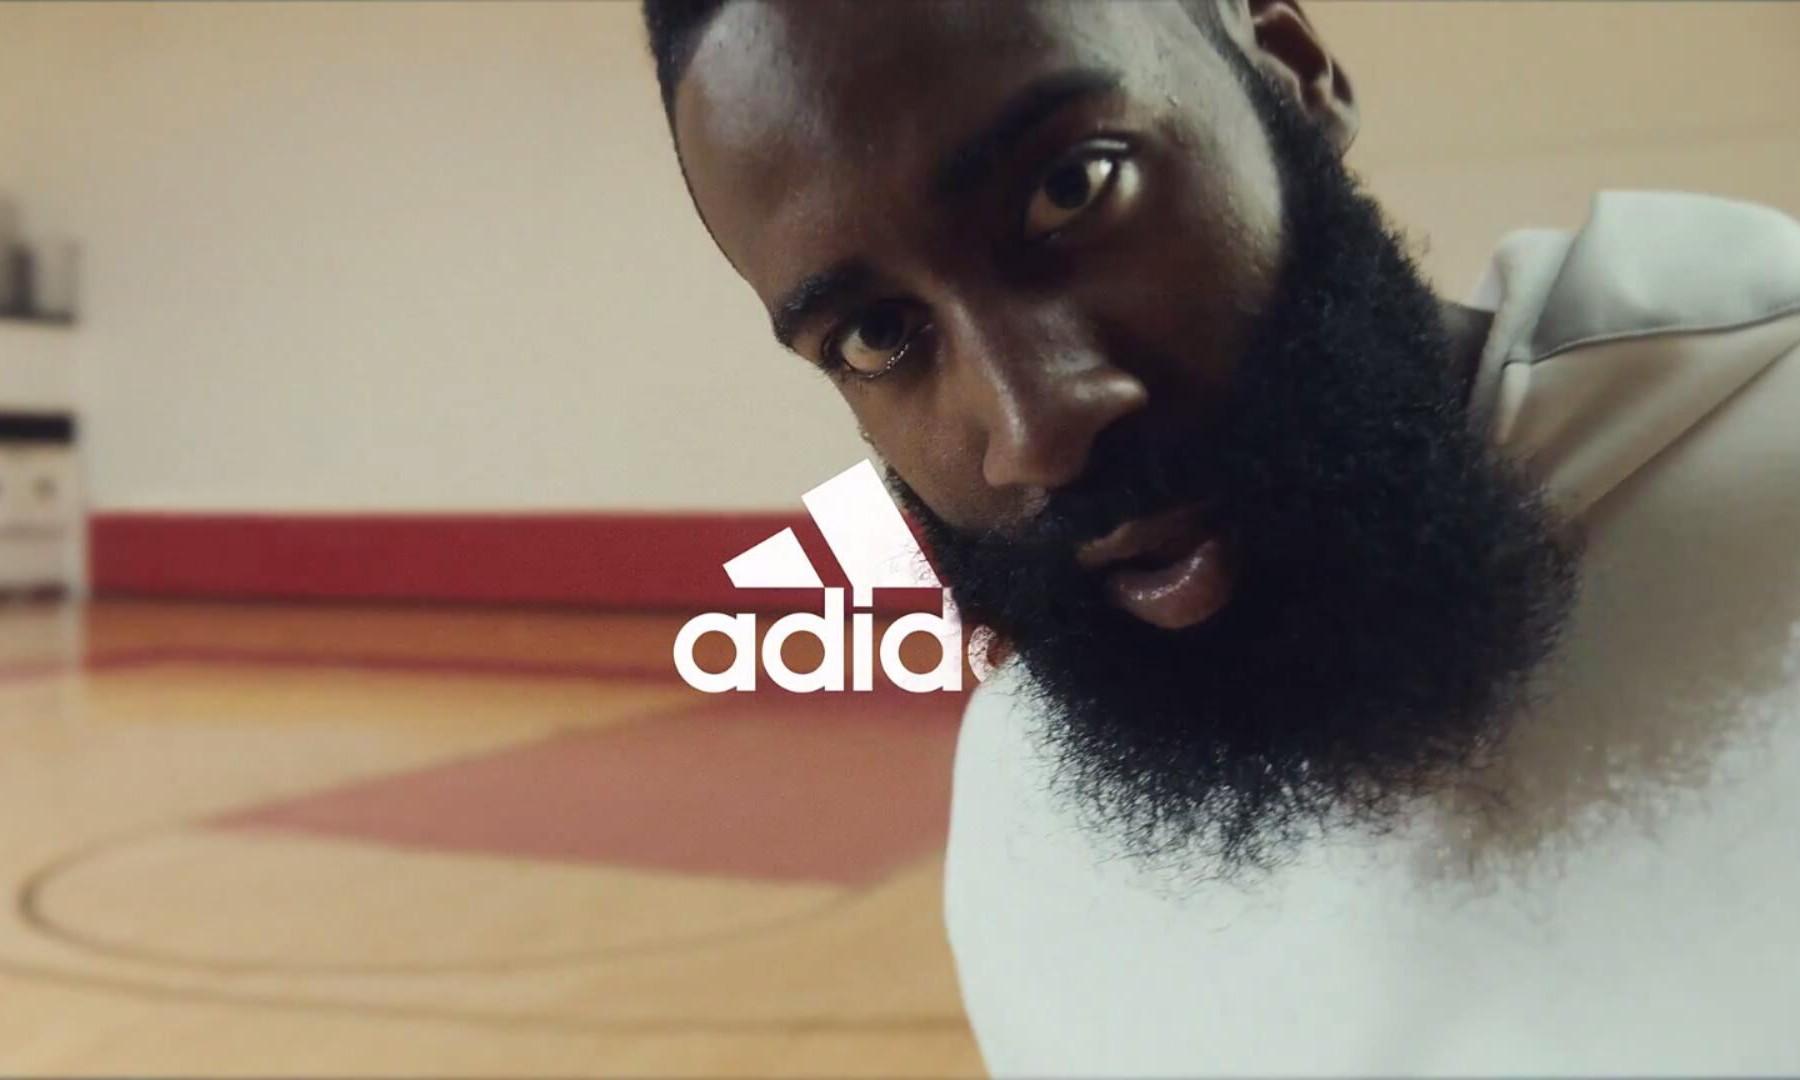 Creators Never Follow,James Harden 首支 adidas 广告片发布